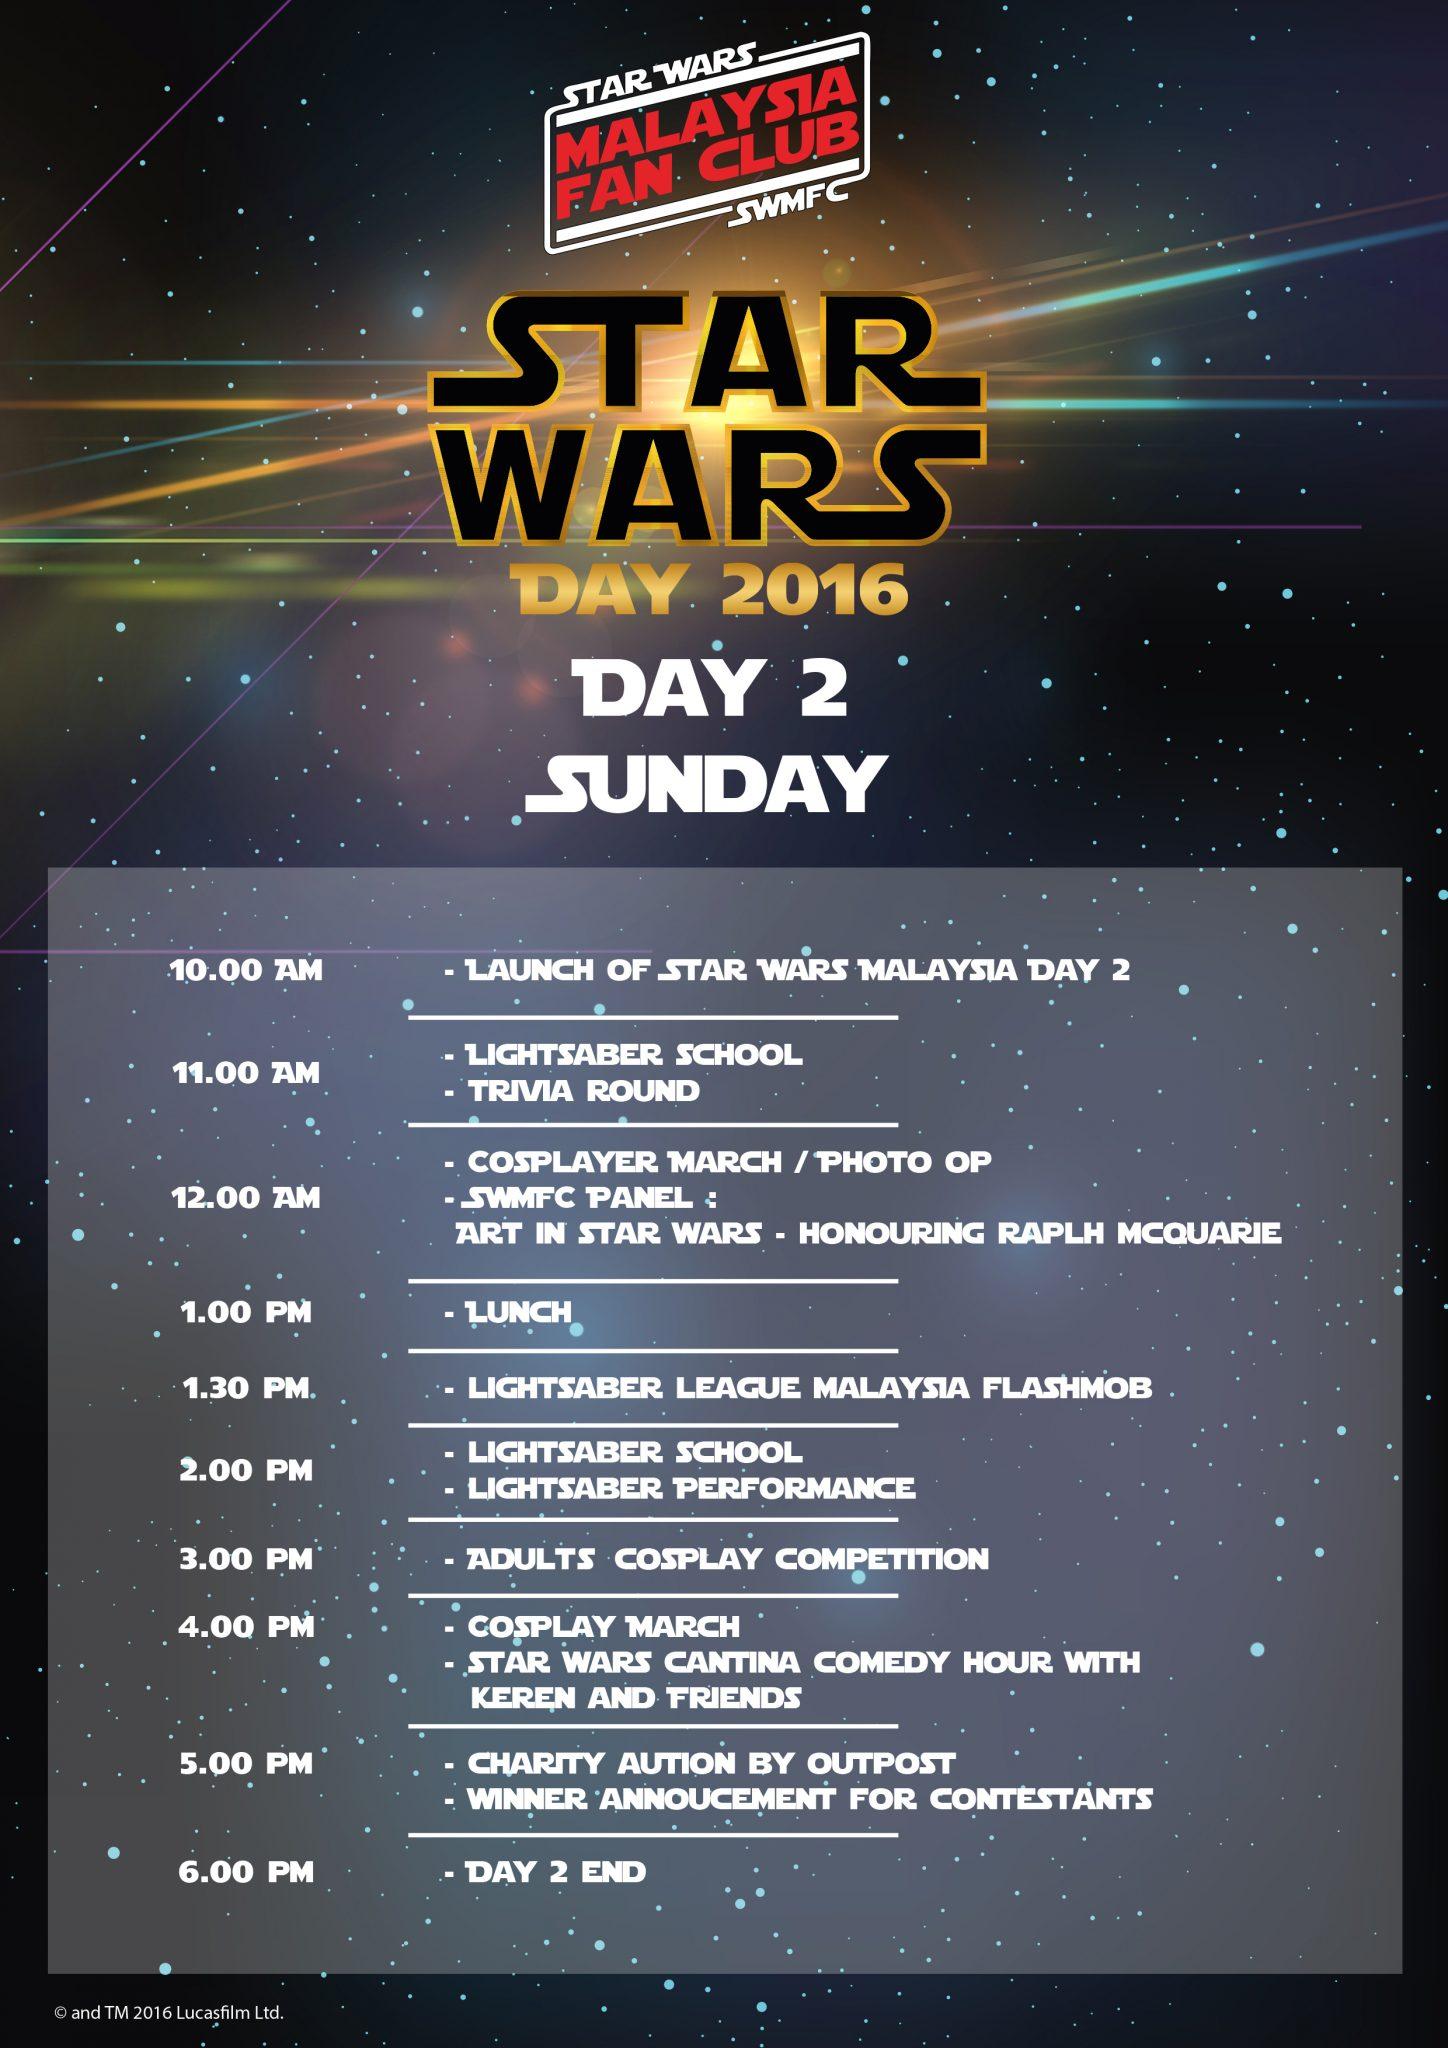 Star Wars Day Malaysia 2016